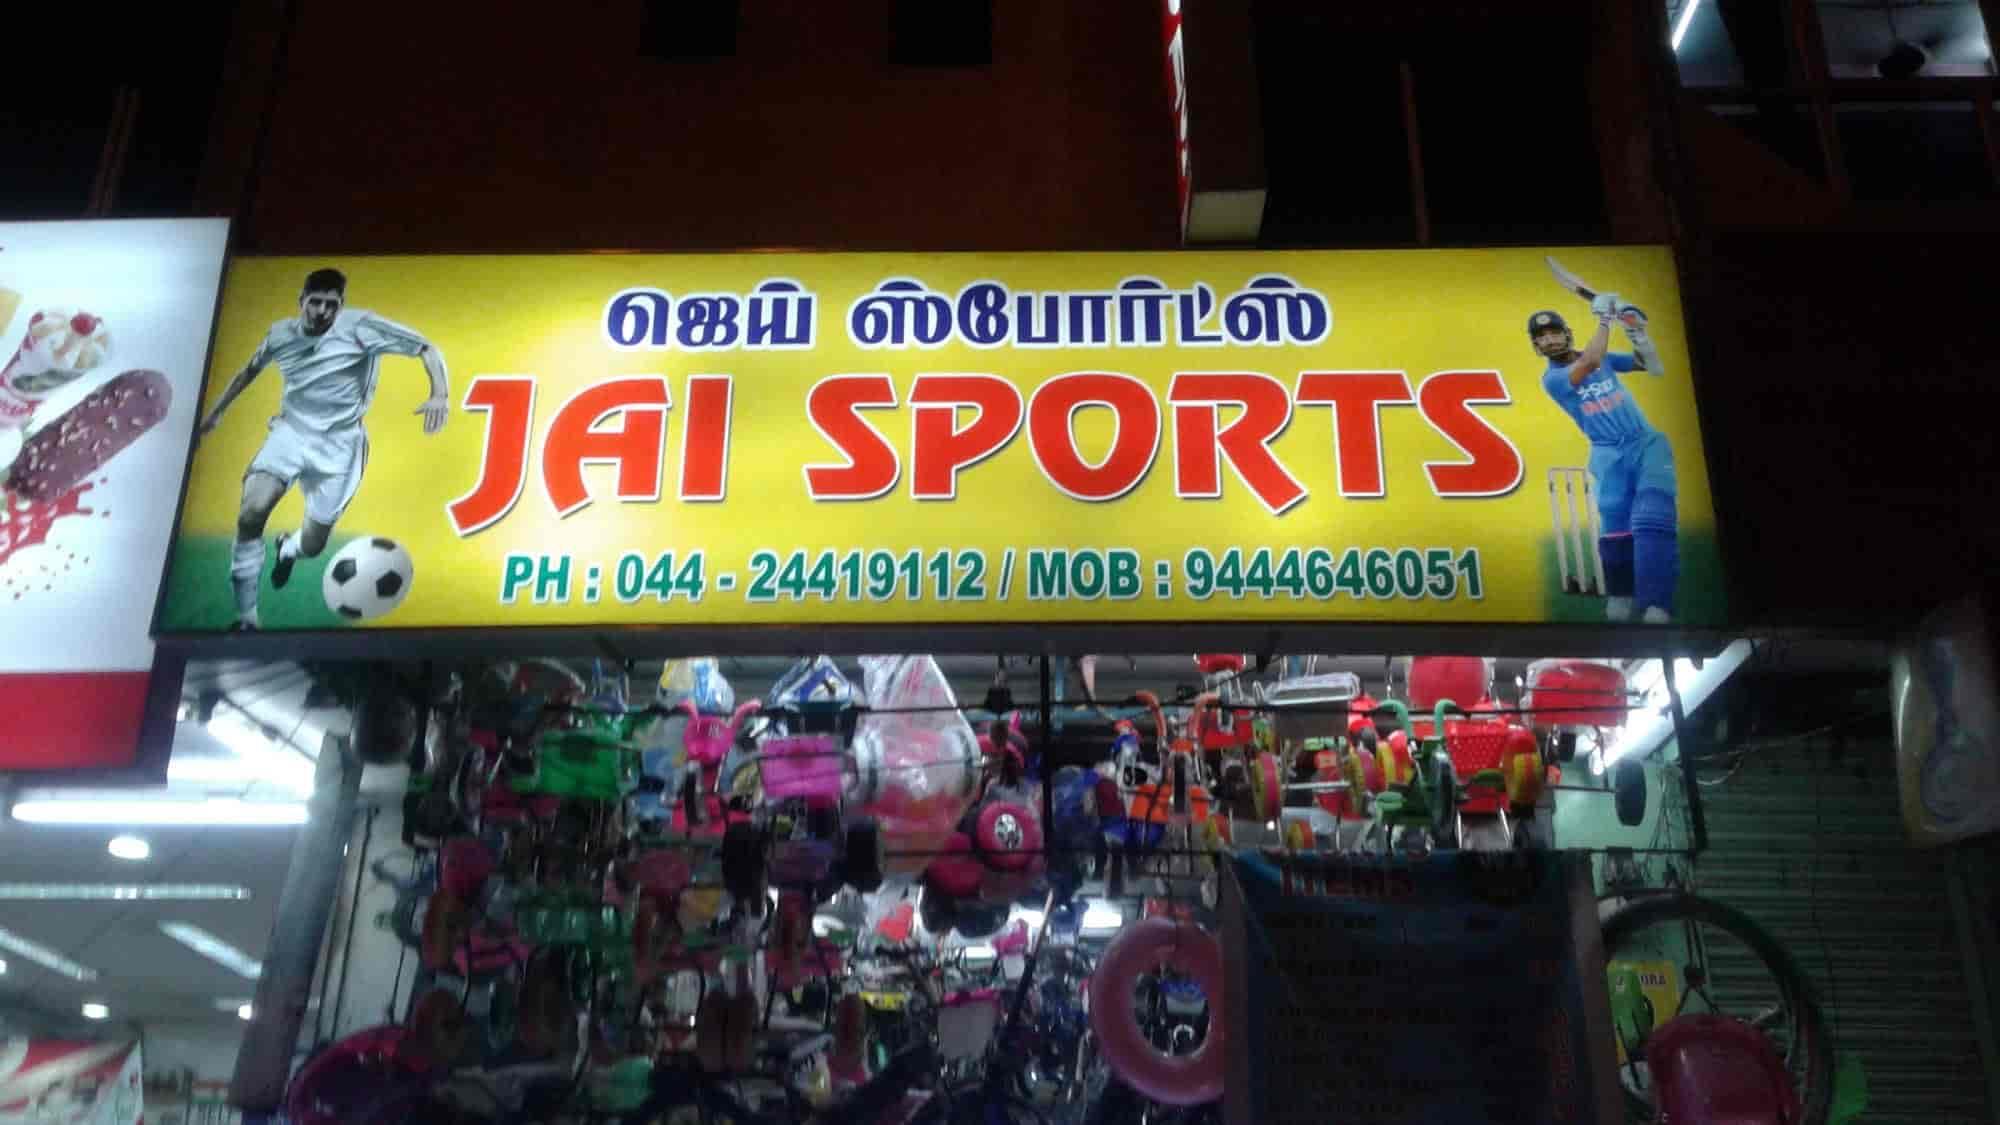 Jai sports thiruvanmiyur jay sports sports goods dealers in jai sports thiruvanmiyur jay sports sports goods dealers in chennai justdial solutioingenieria Image collections